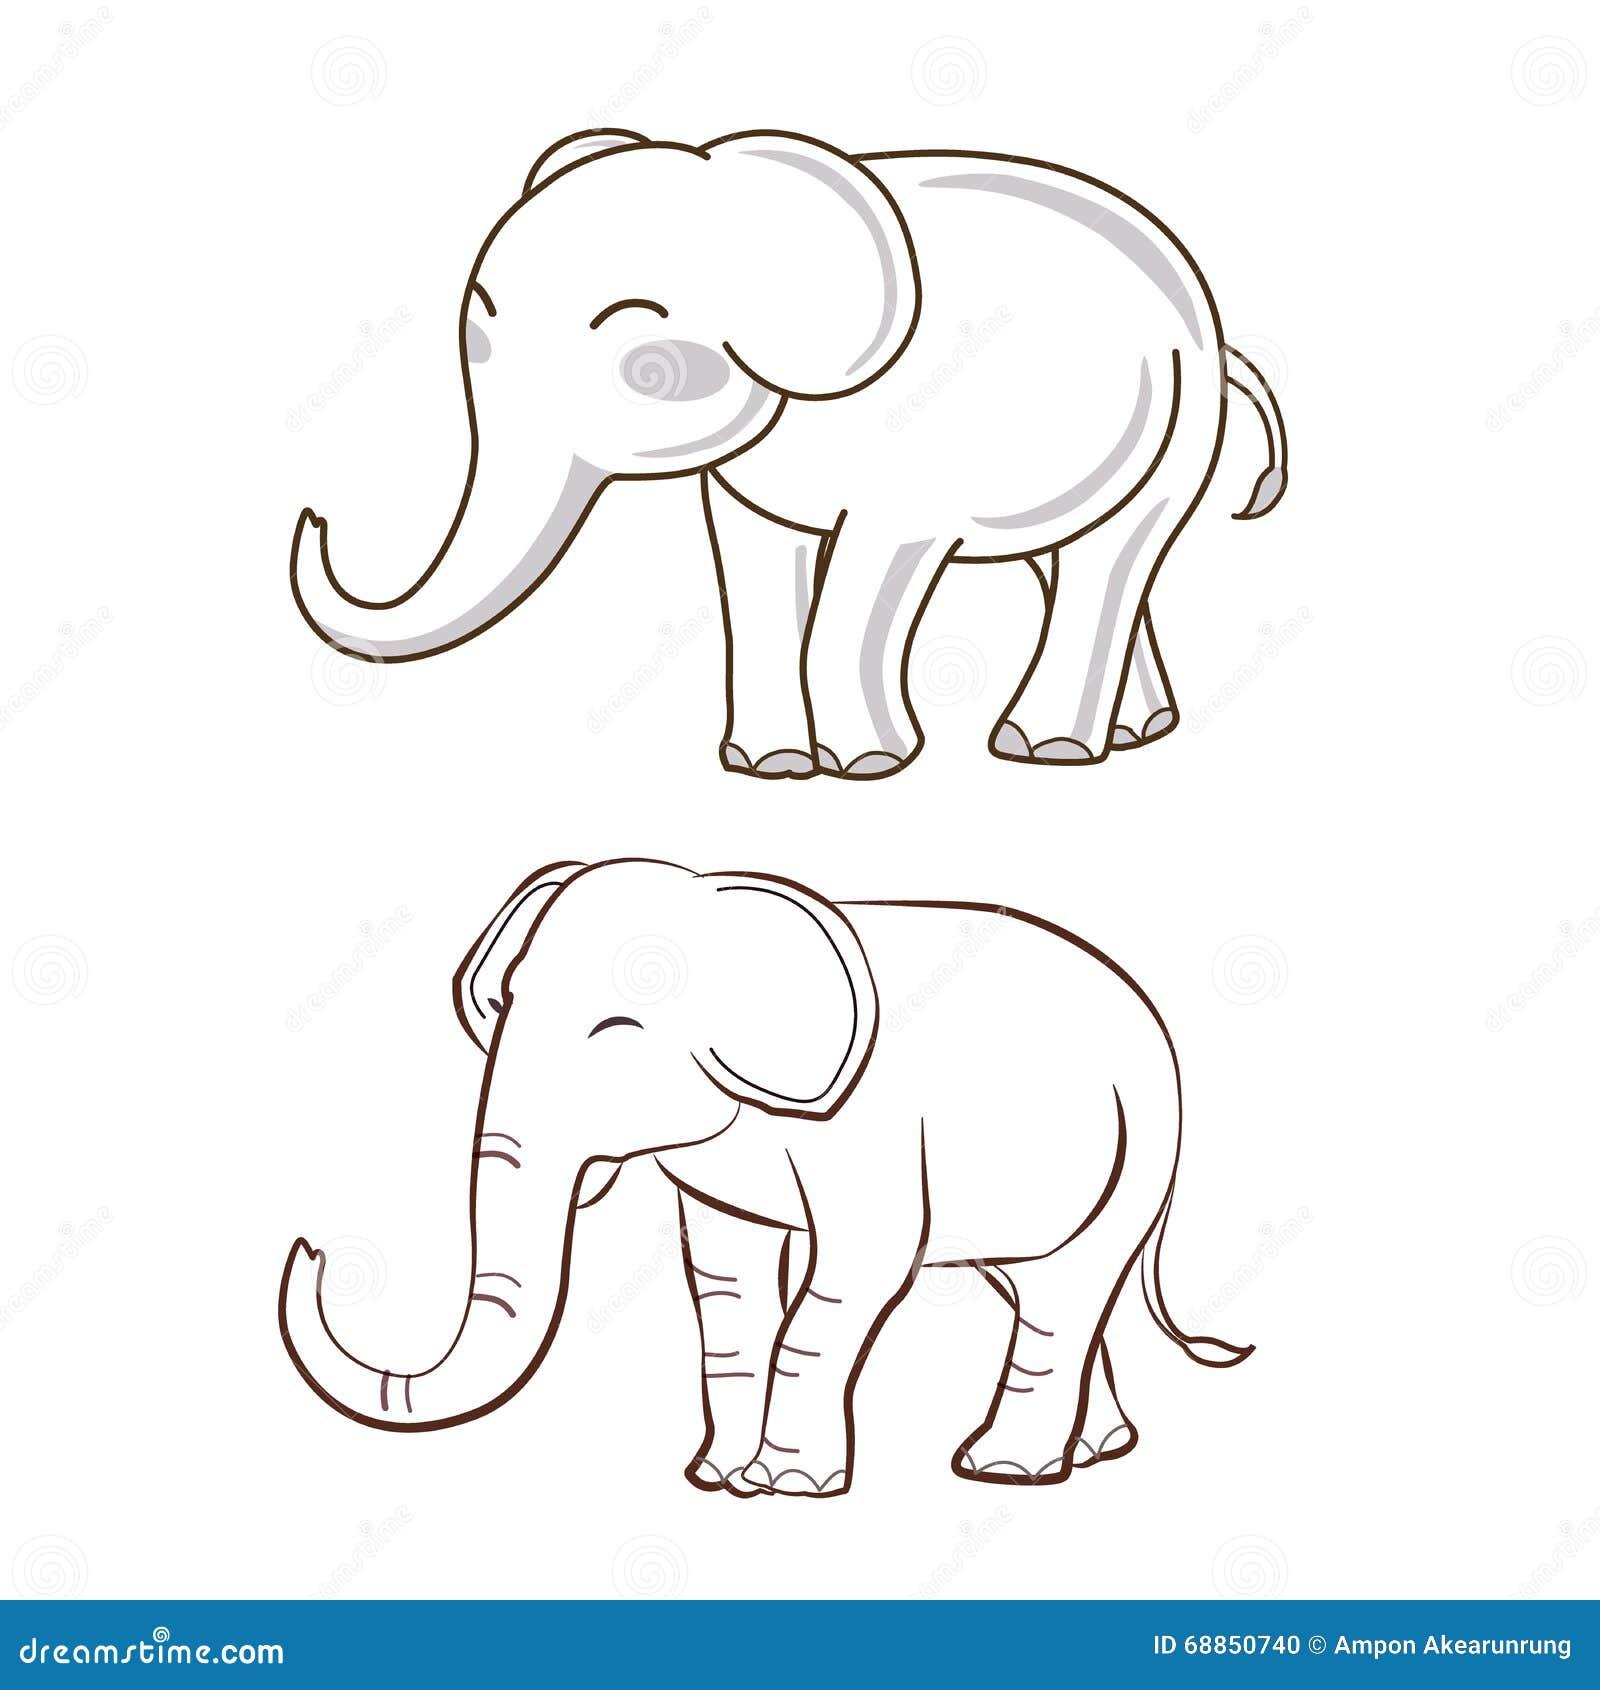 2 elephant cartoon stock vector. Illustration of element ...